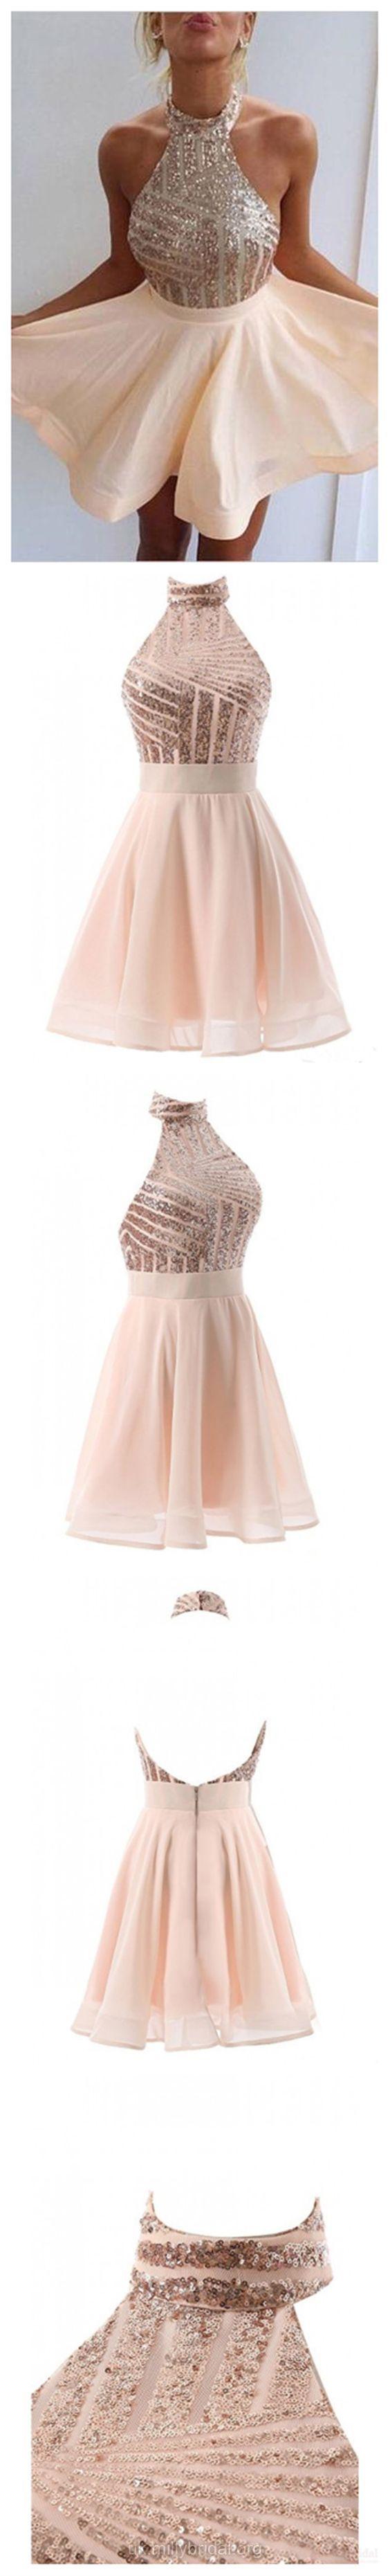 Short prom dresses for teens prom dresses cheap aline